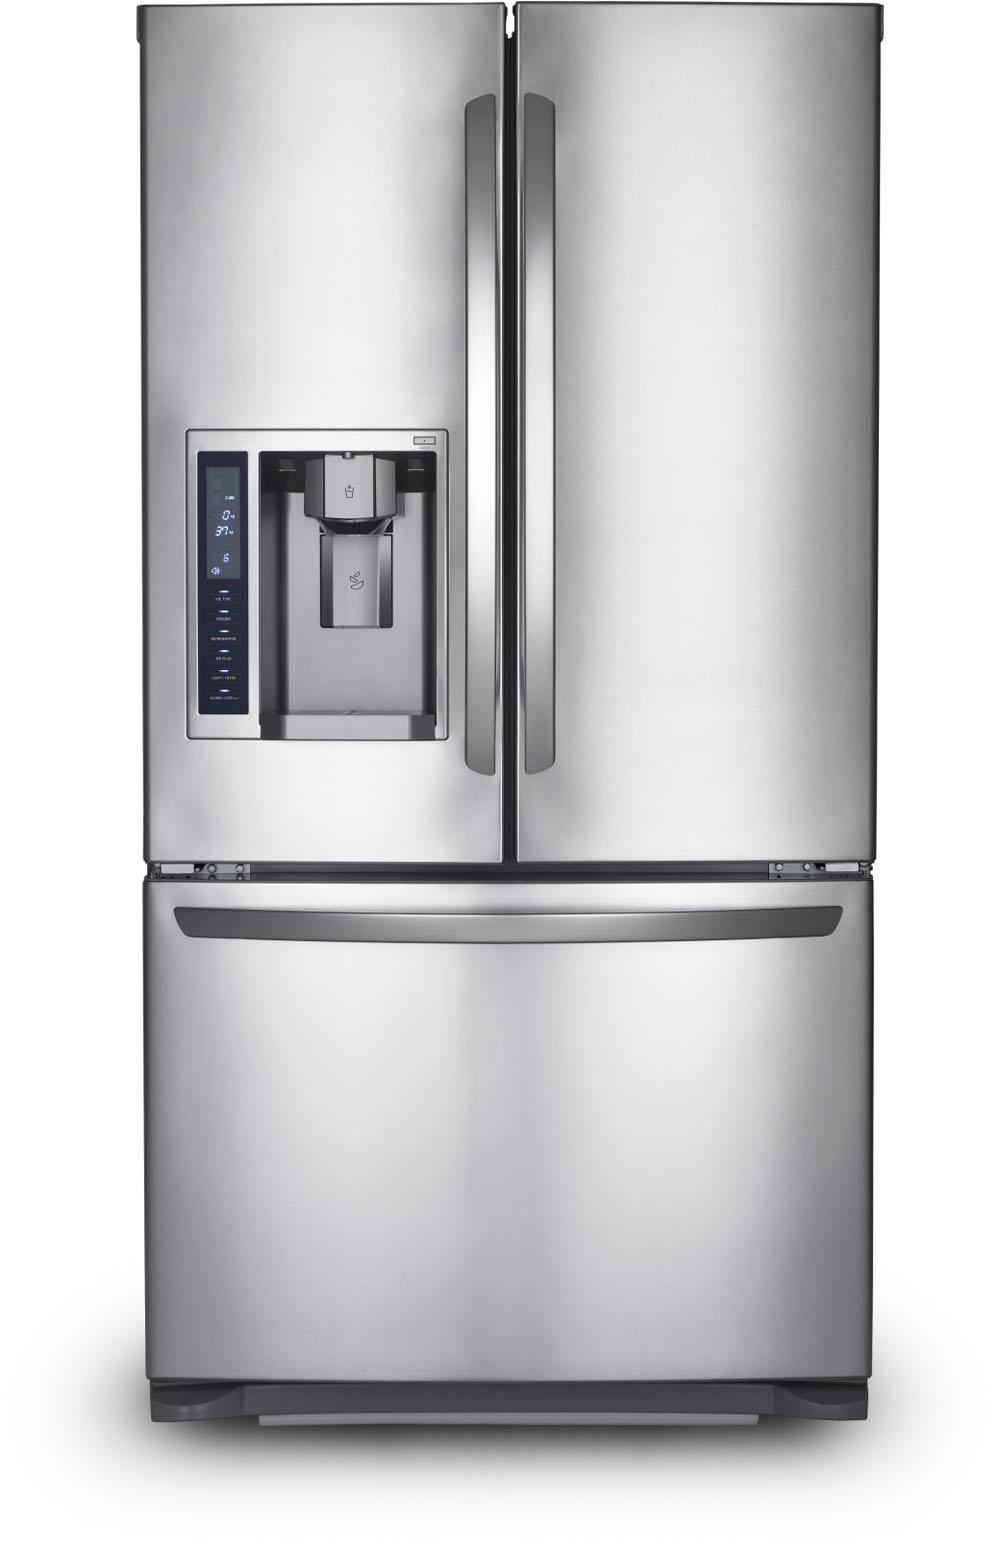 large kitchen appliances sink stopper brisk living stainless steel fridge